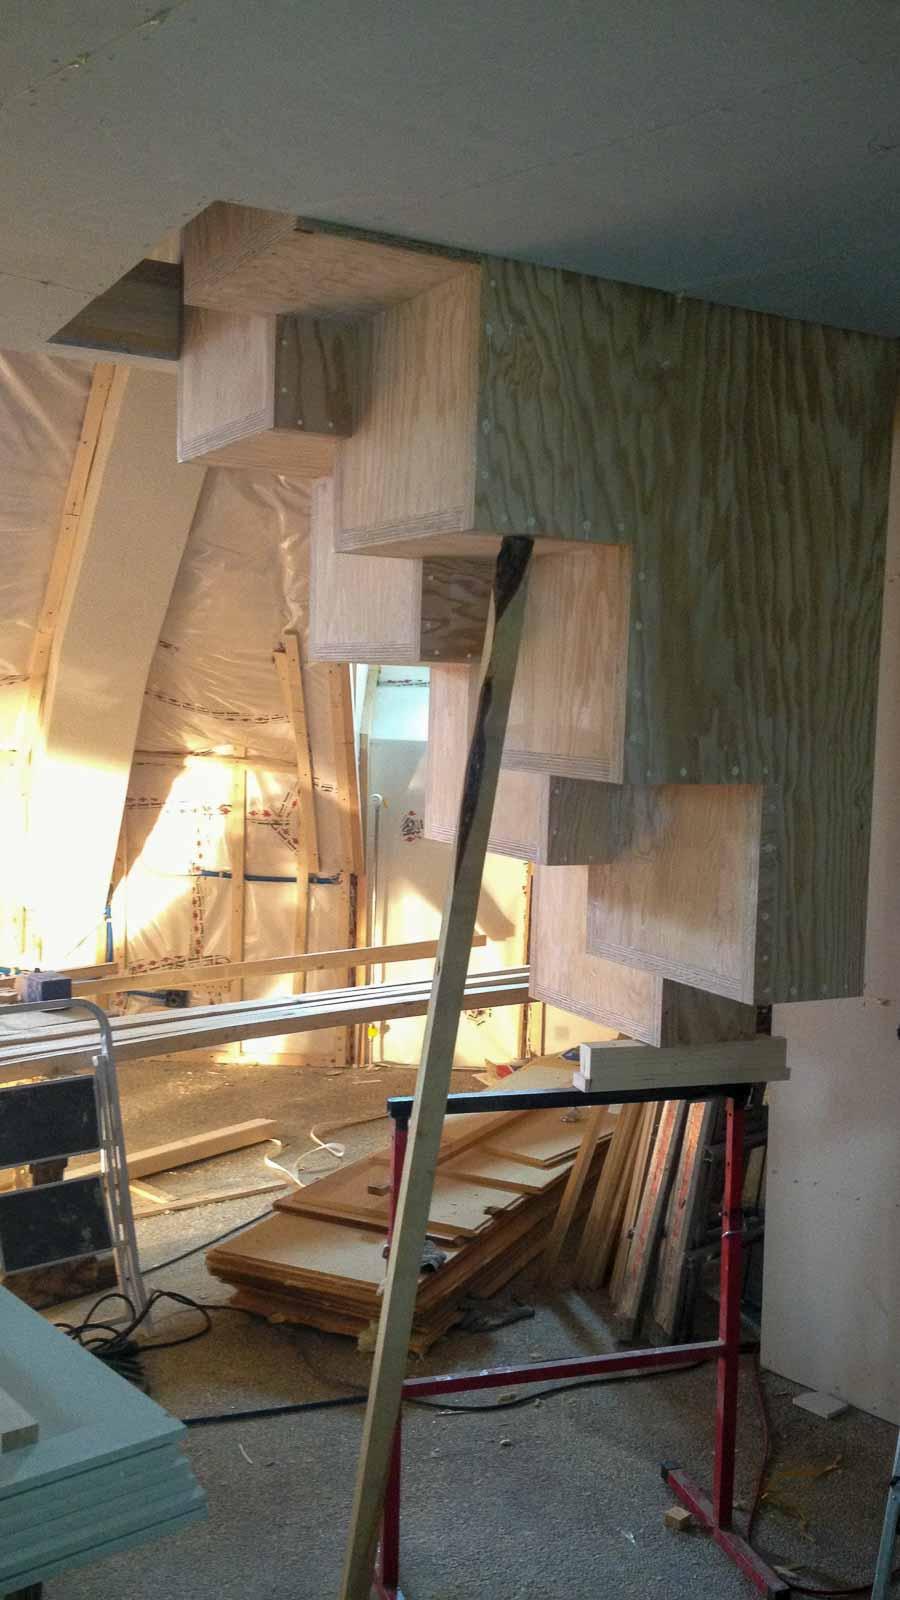 Wooddesign_Holzdesign_Treppe_Holztreppe_schwebend_2-teilig_atelierducret_freiburg(8)